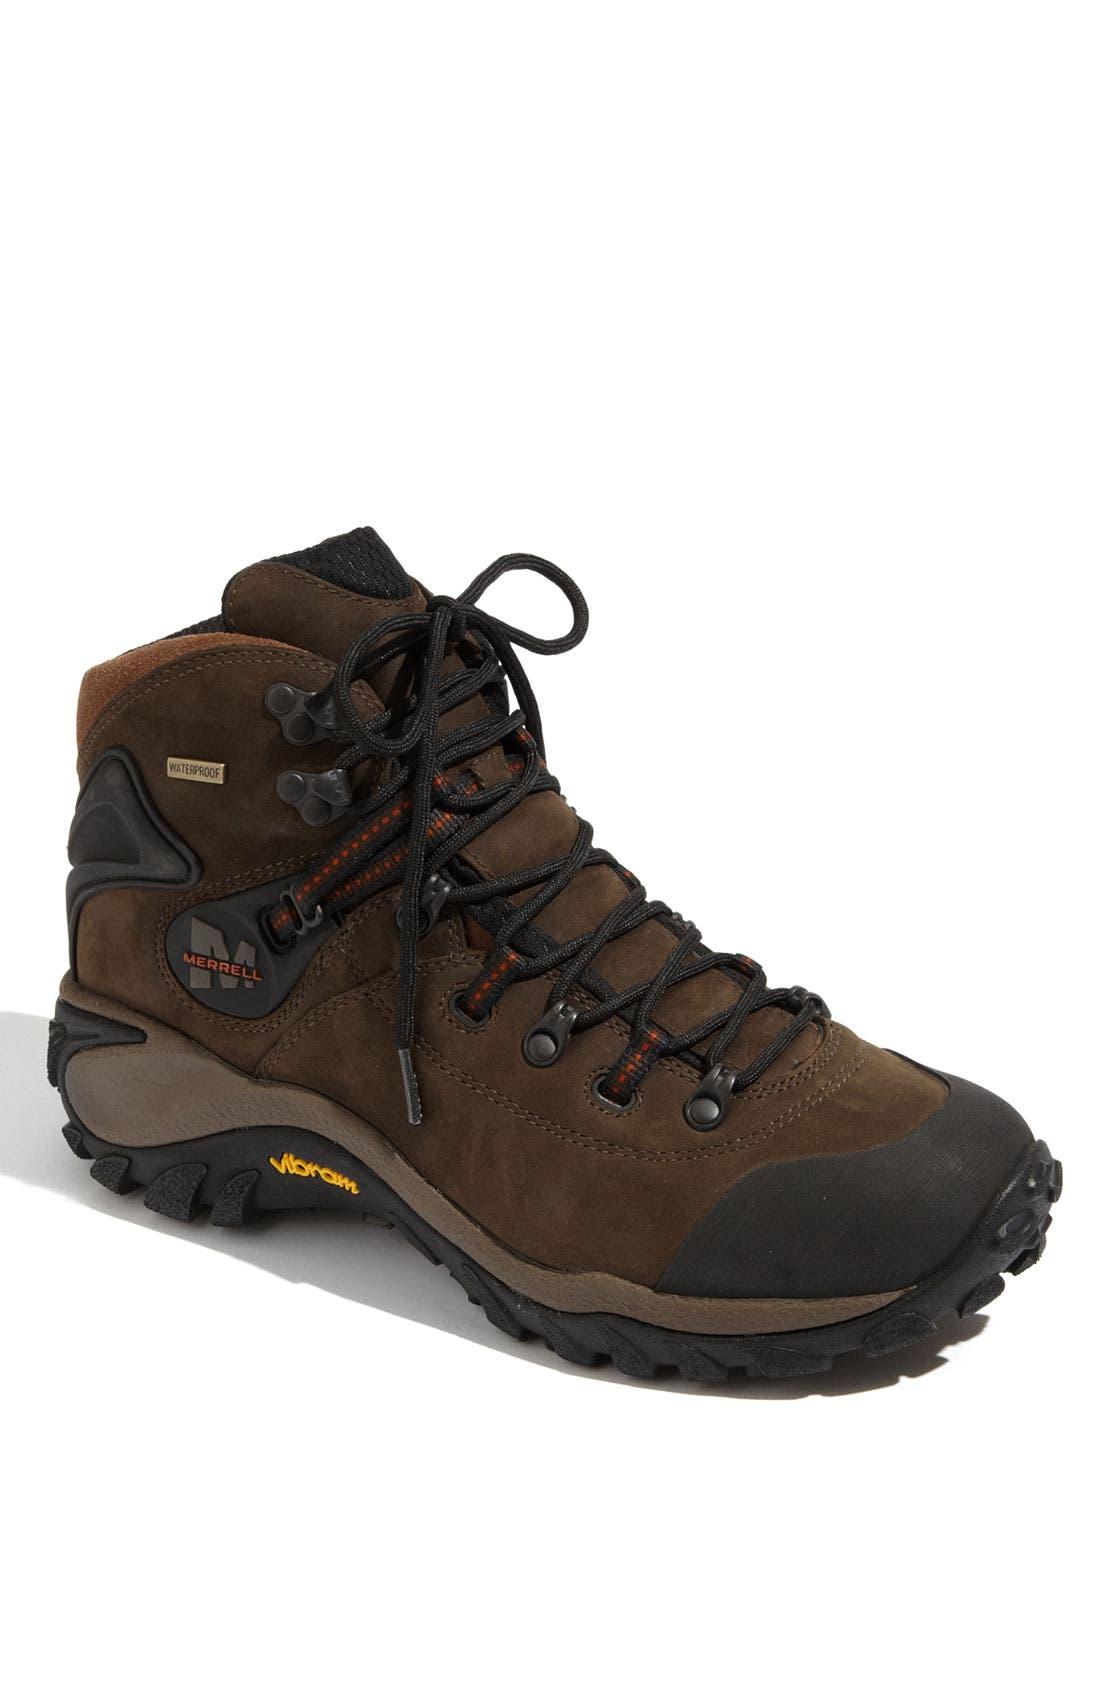 Main Image - Merrell 'Phaser Peak Waterproof' Boot (Online Only)